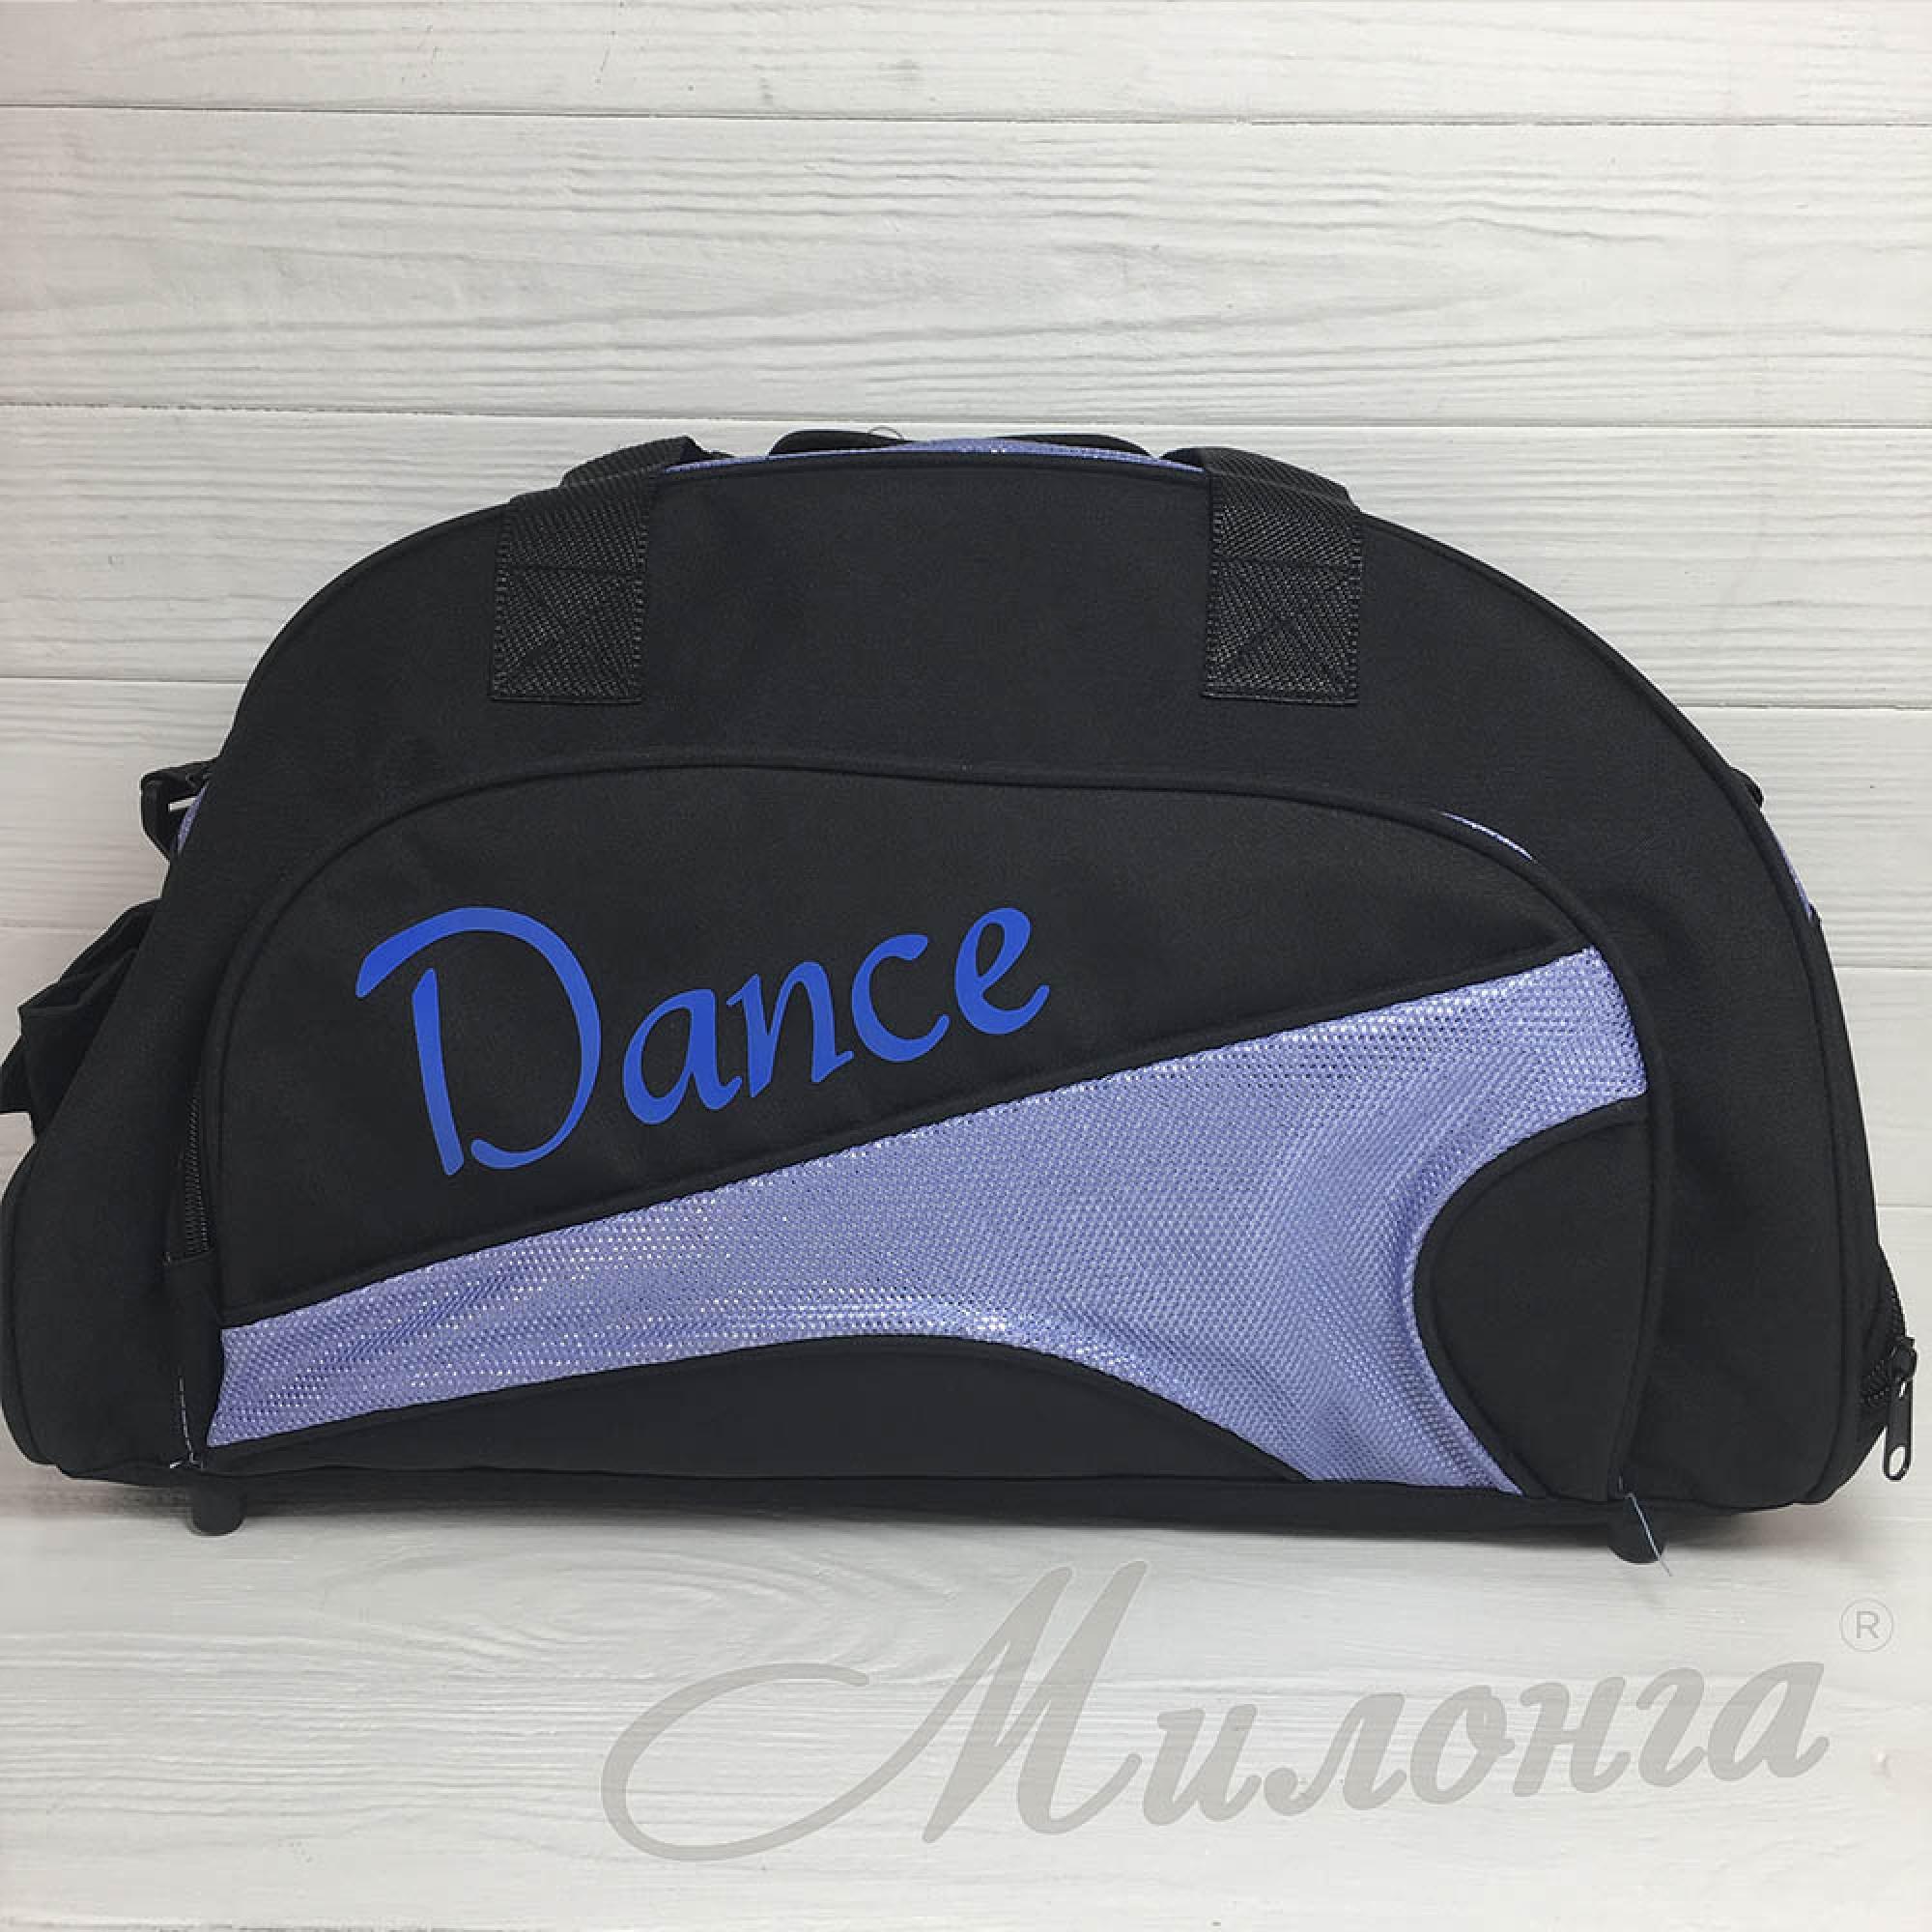 Сумка Dance голубой